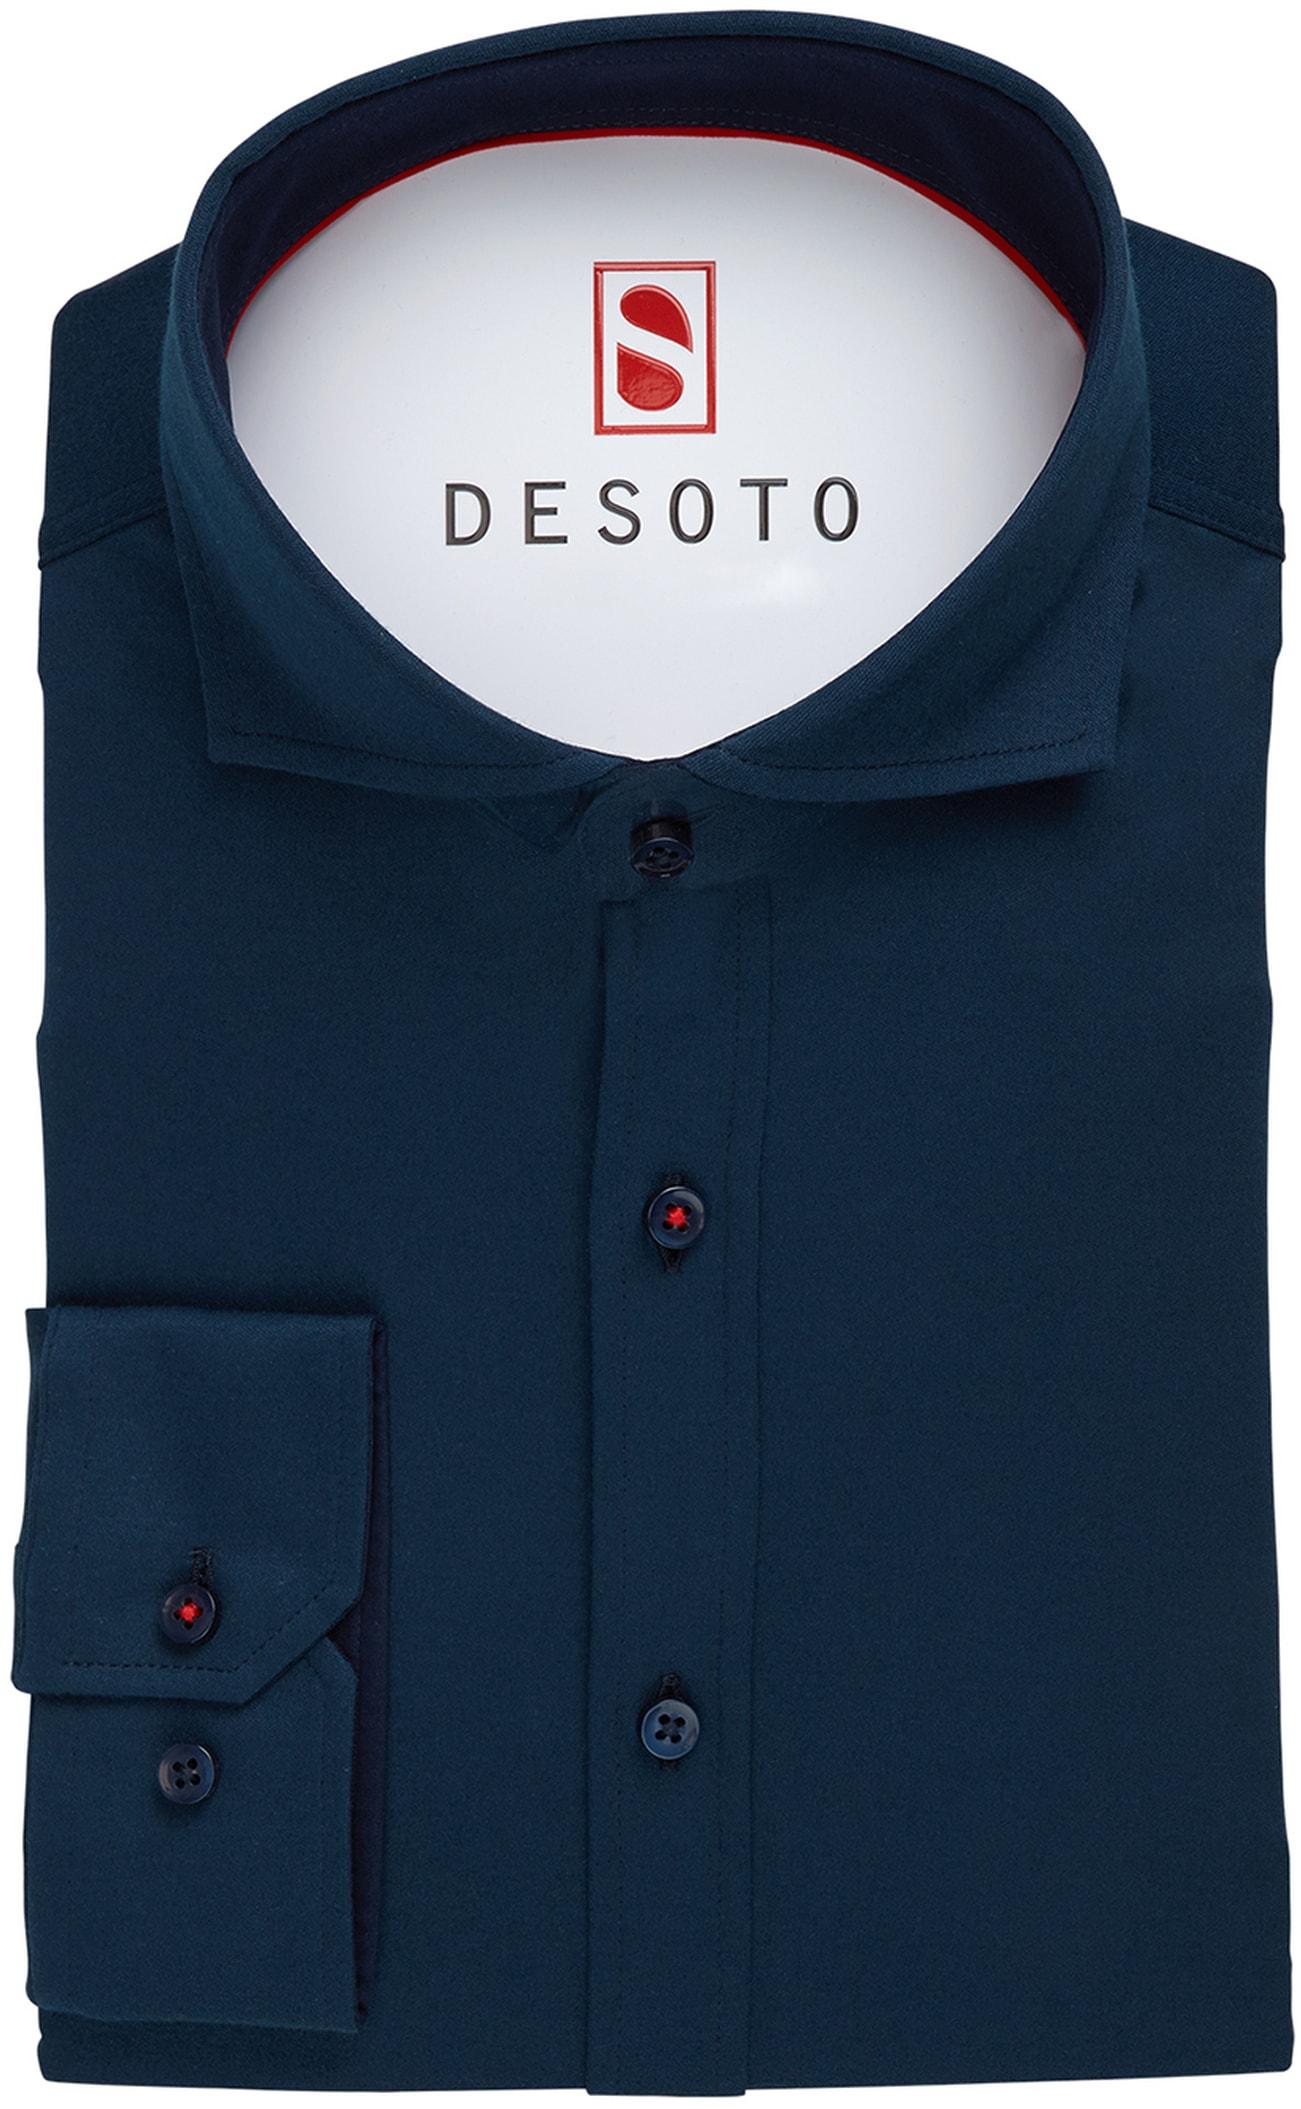 Desoto Overhemd Strijkvrij Donkerblauw foto 2